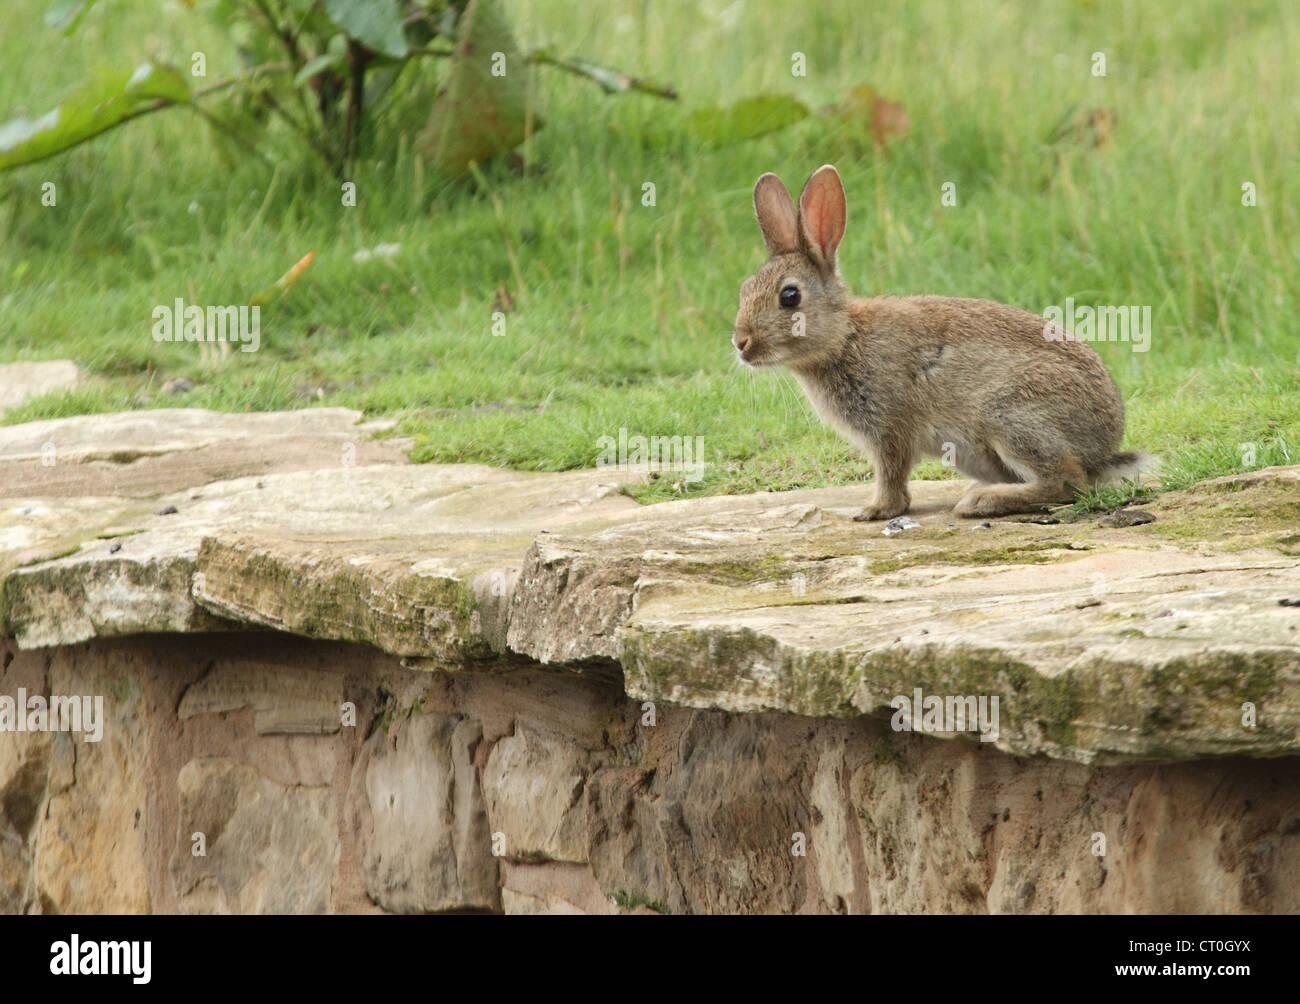 rabbit eating on a grass embankment - Stock Image